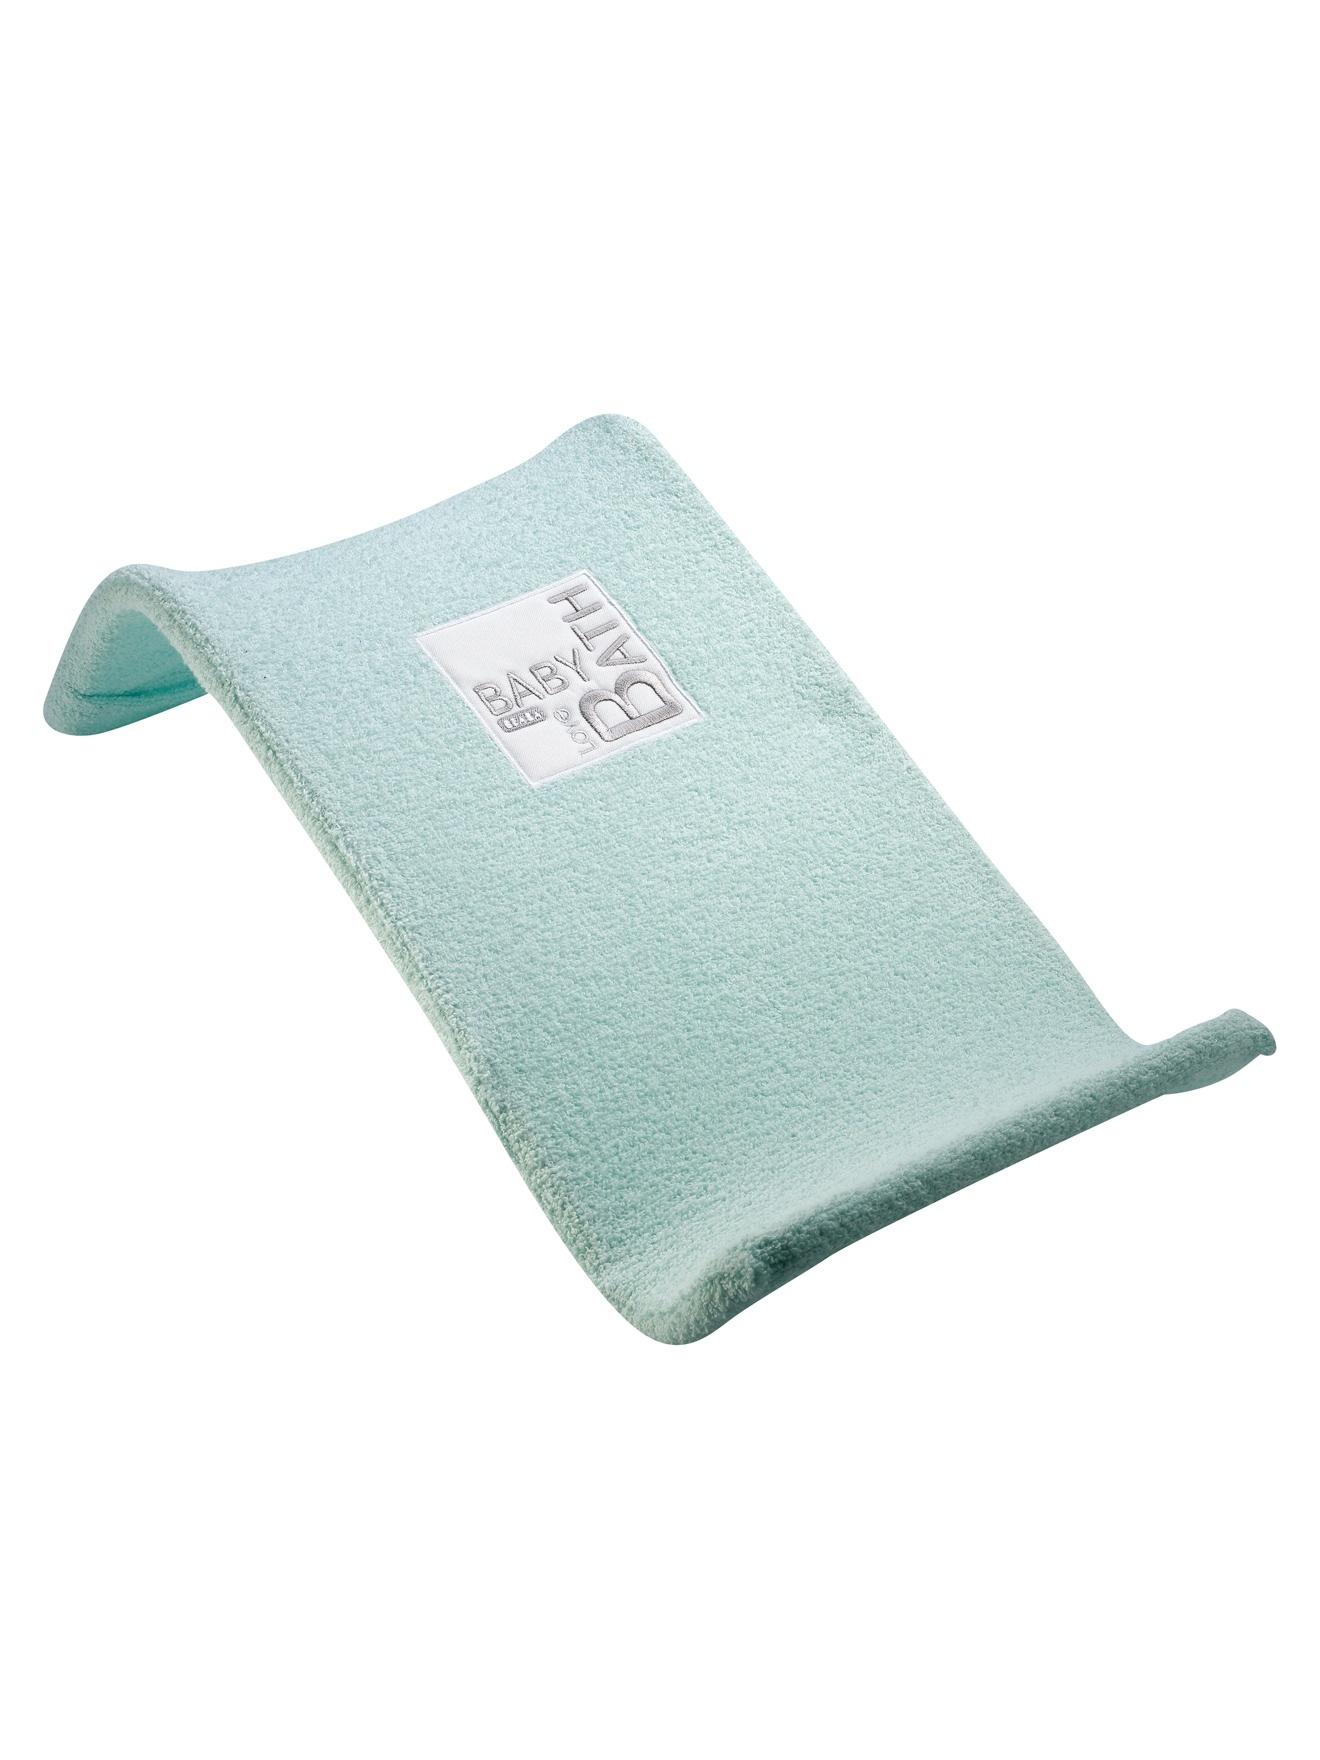 transat de bain en tissu ponge confidences de maman. Black Bedroom Furniture Sets. Home Design Ideas